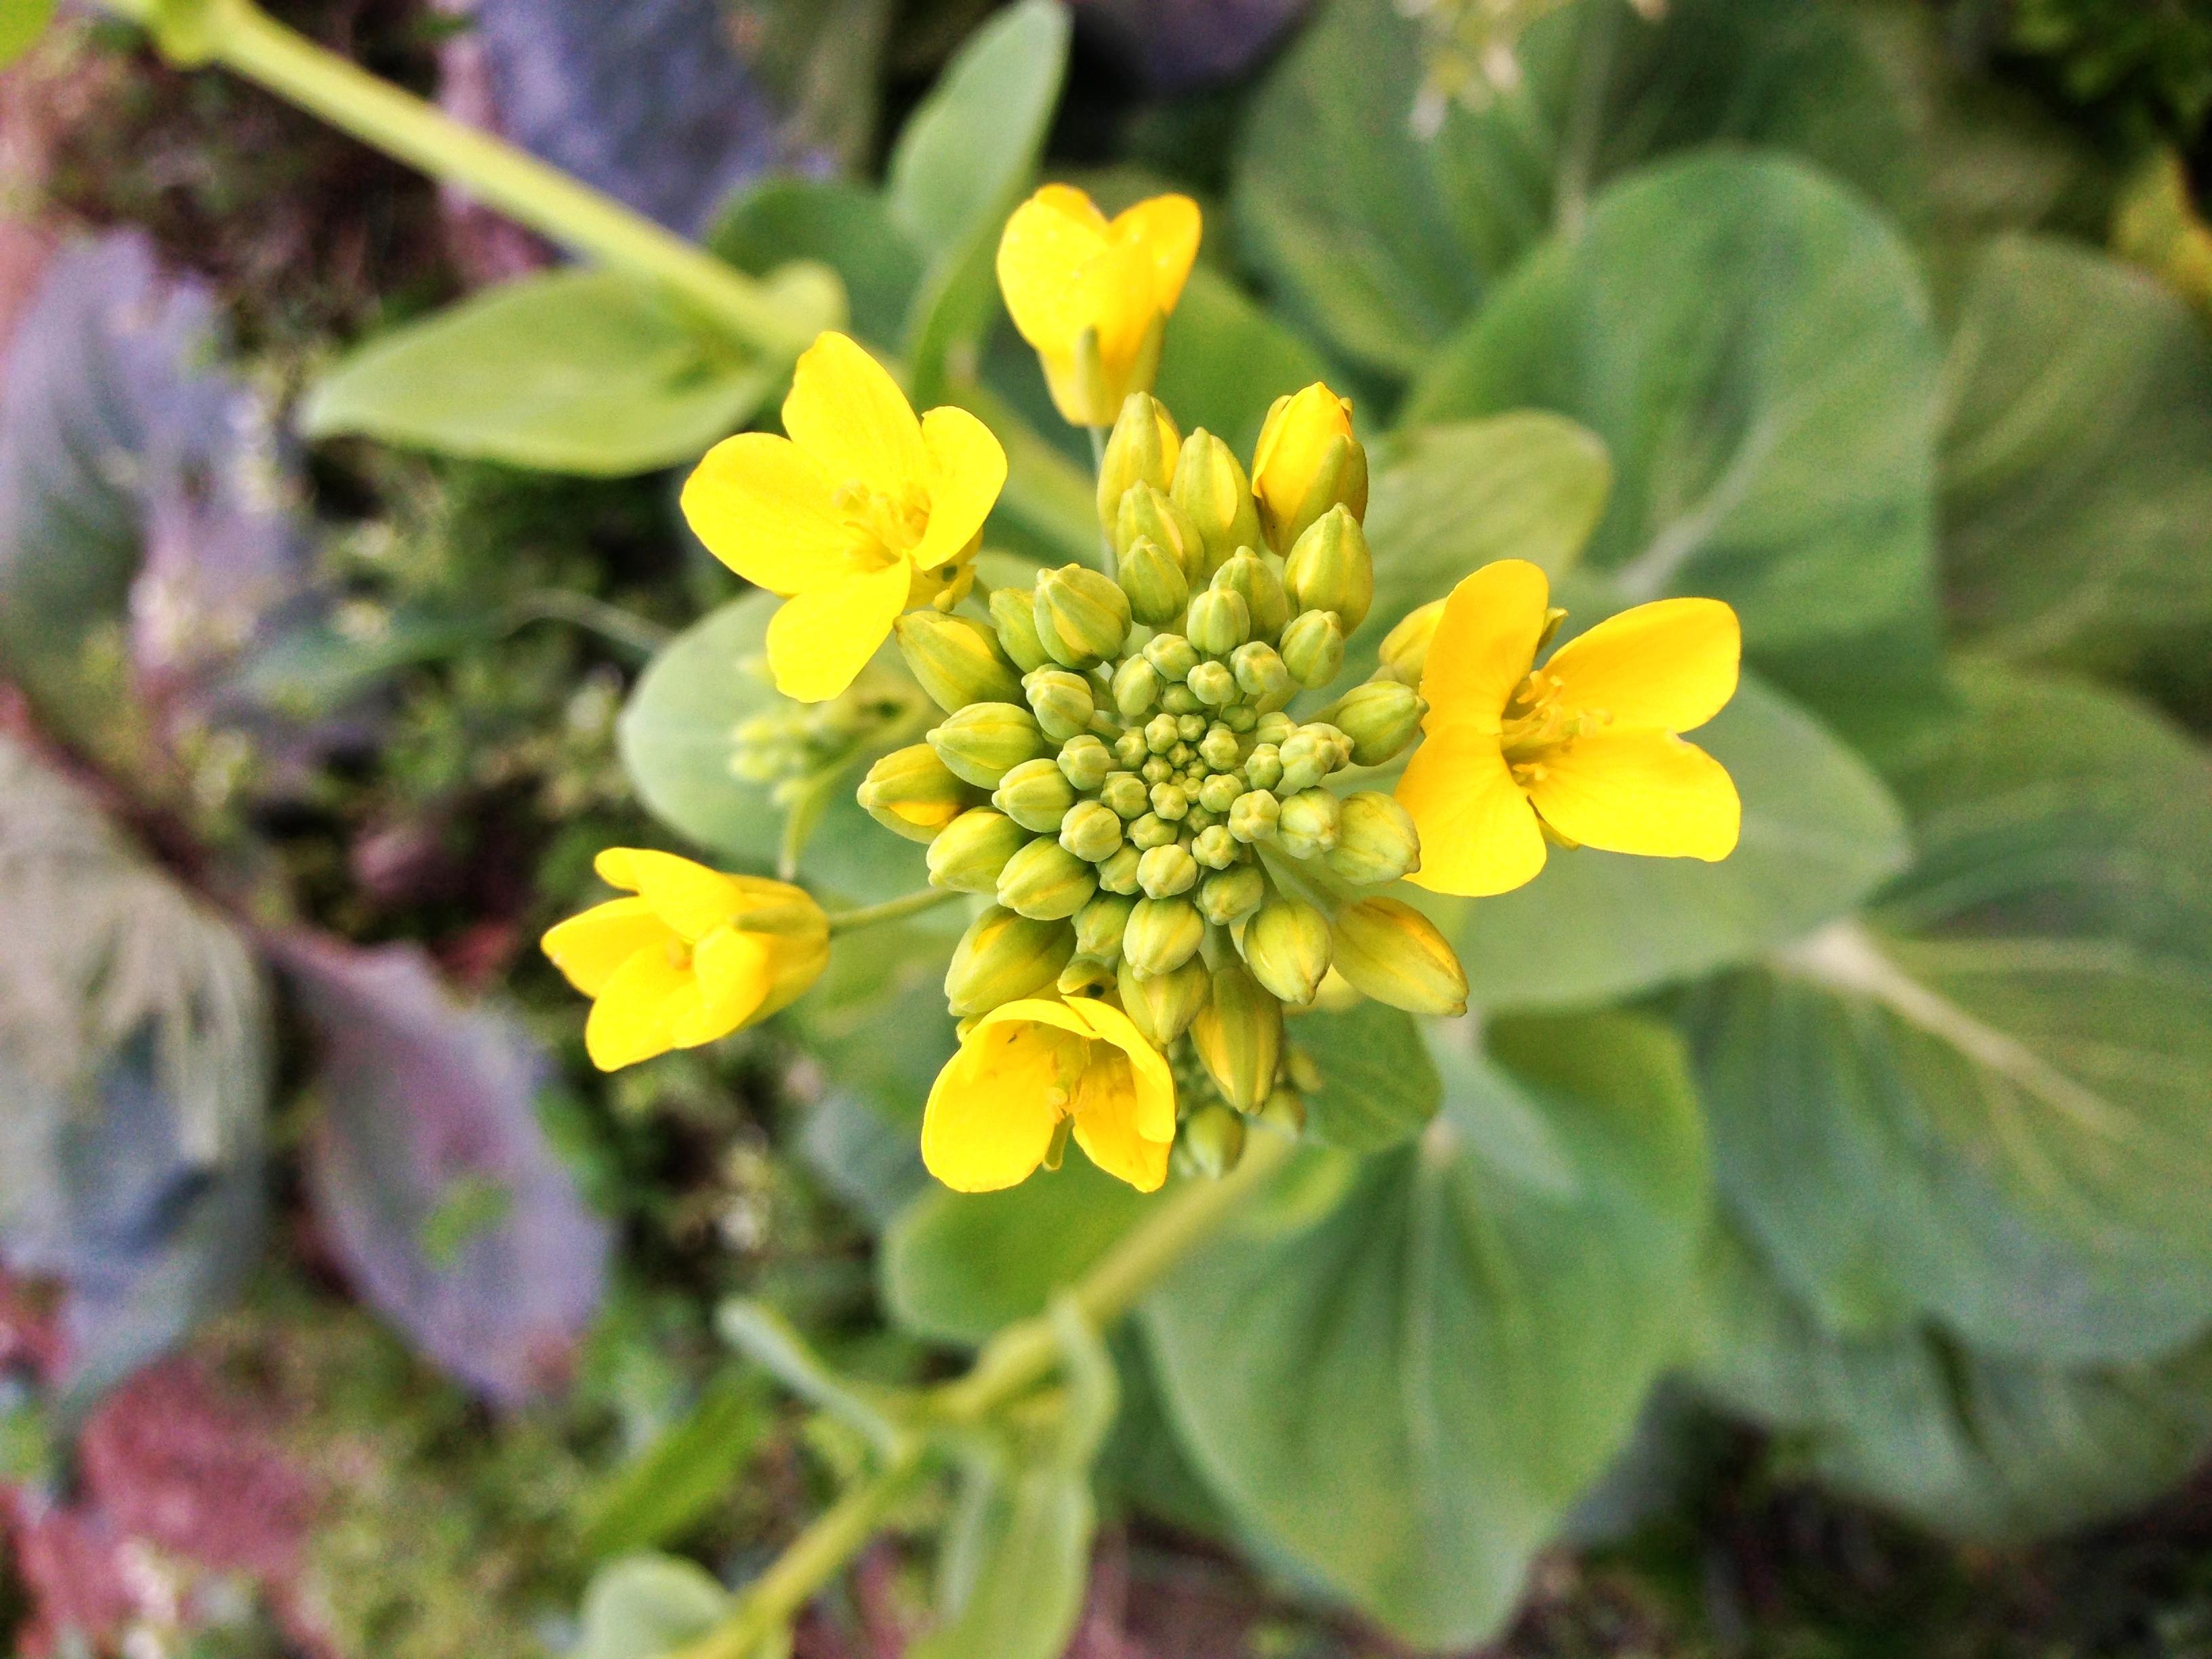 The Mustard Seed Food Bank